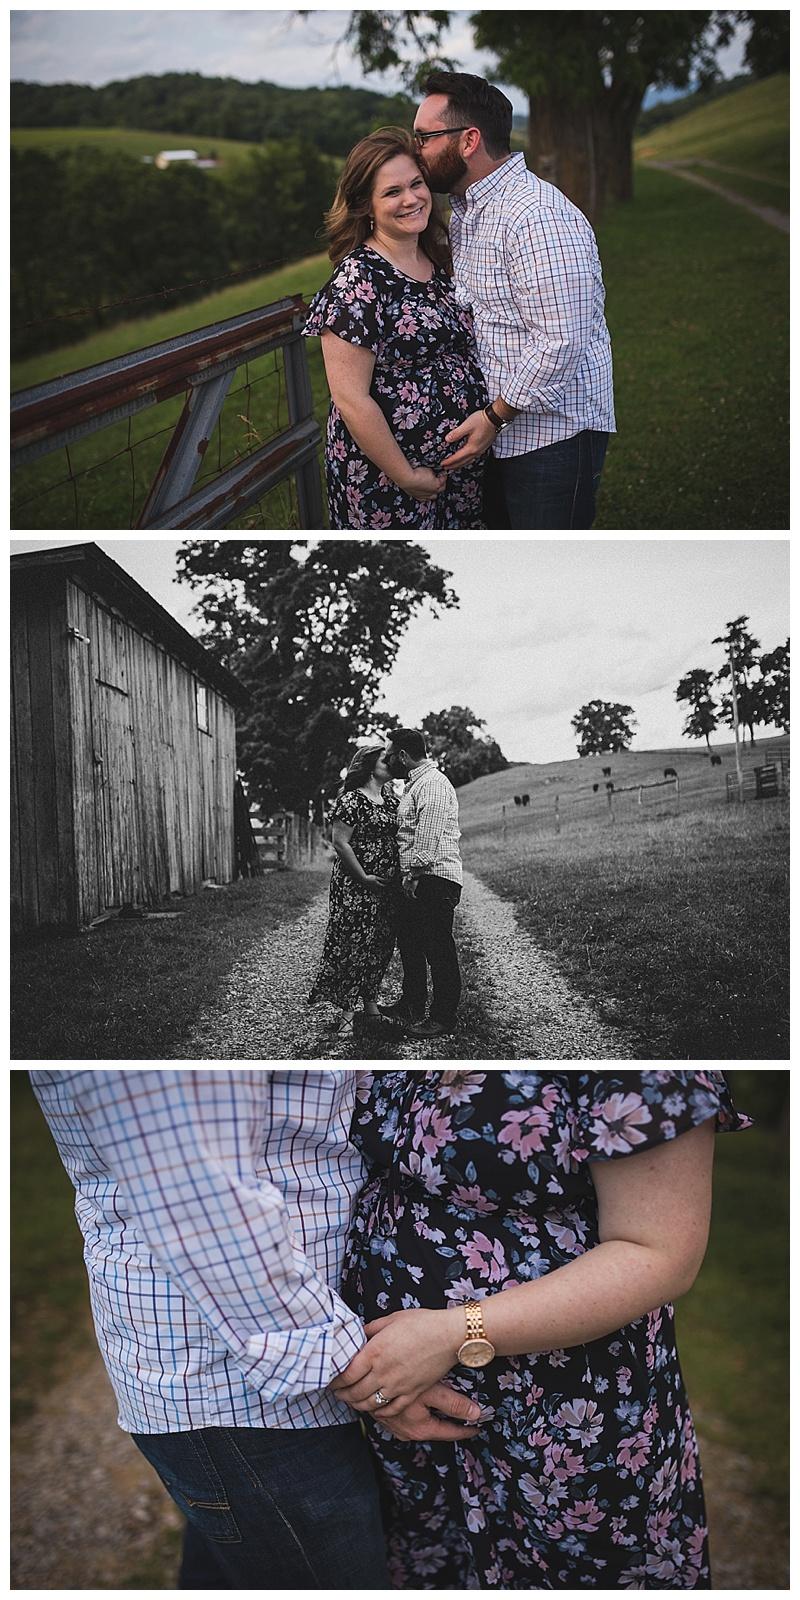 EmilyRogers-southwest-virginia-wedding-photographer_0001.jpg